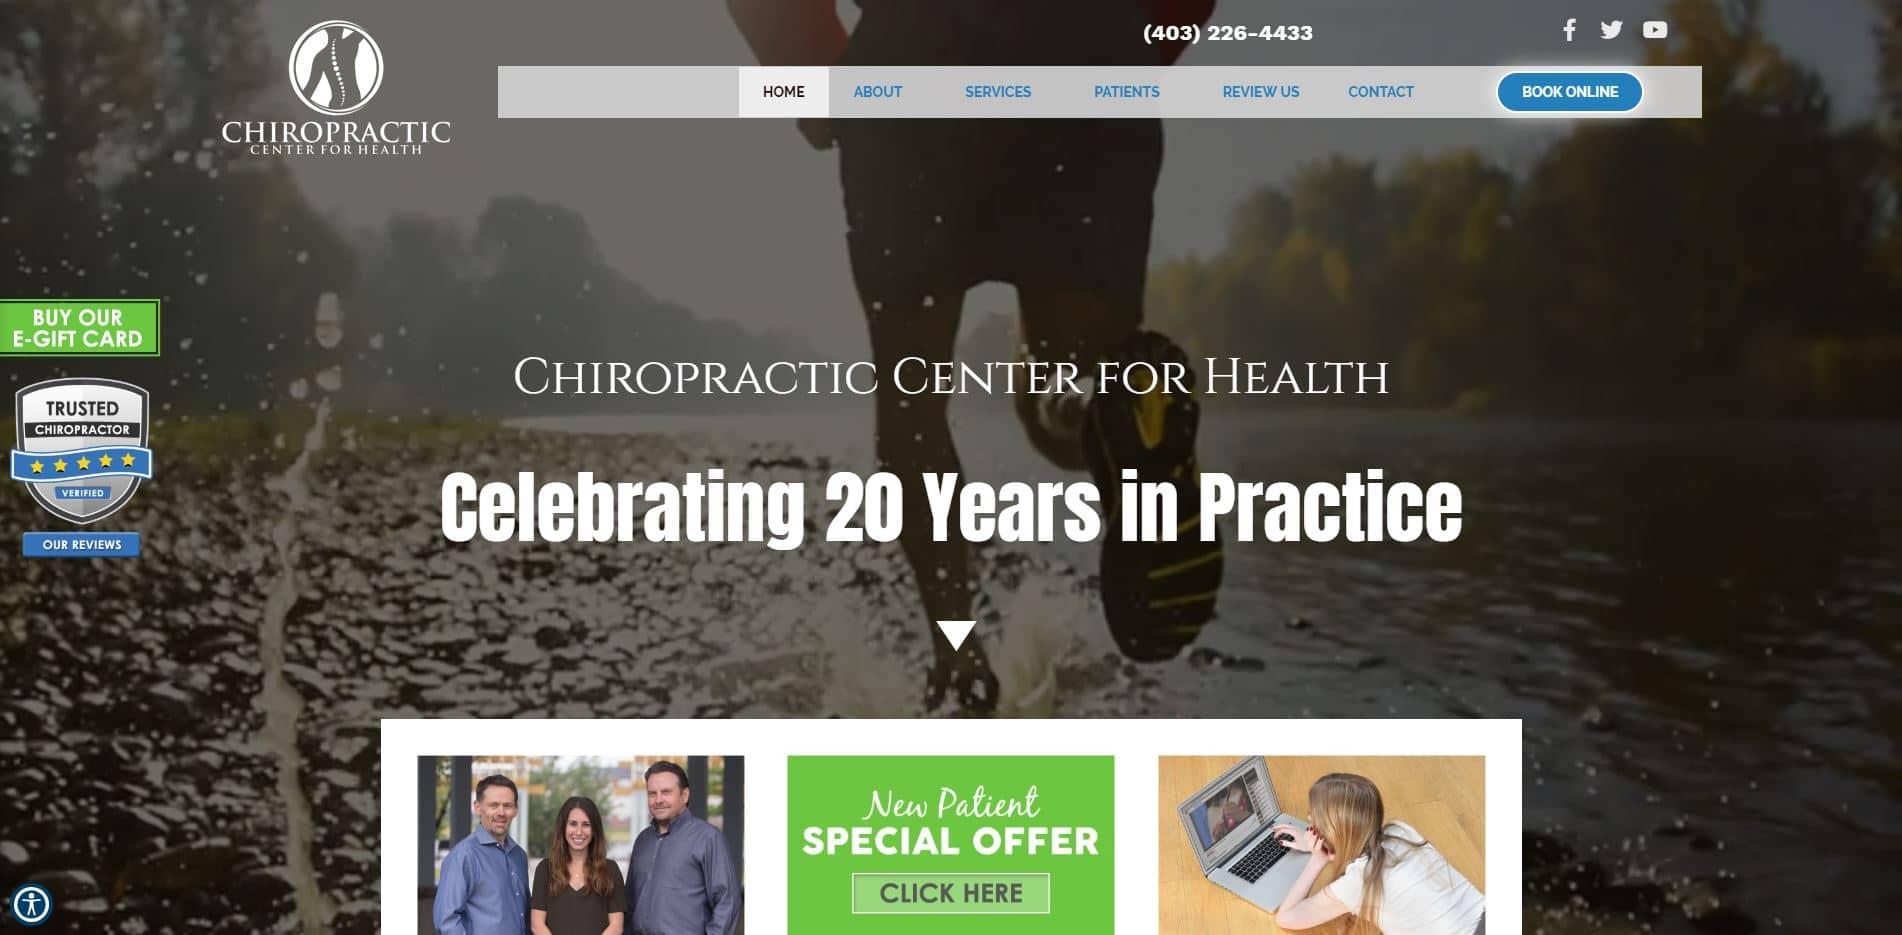 Chiropractor in Calgary